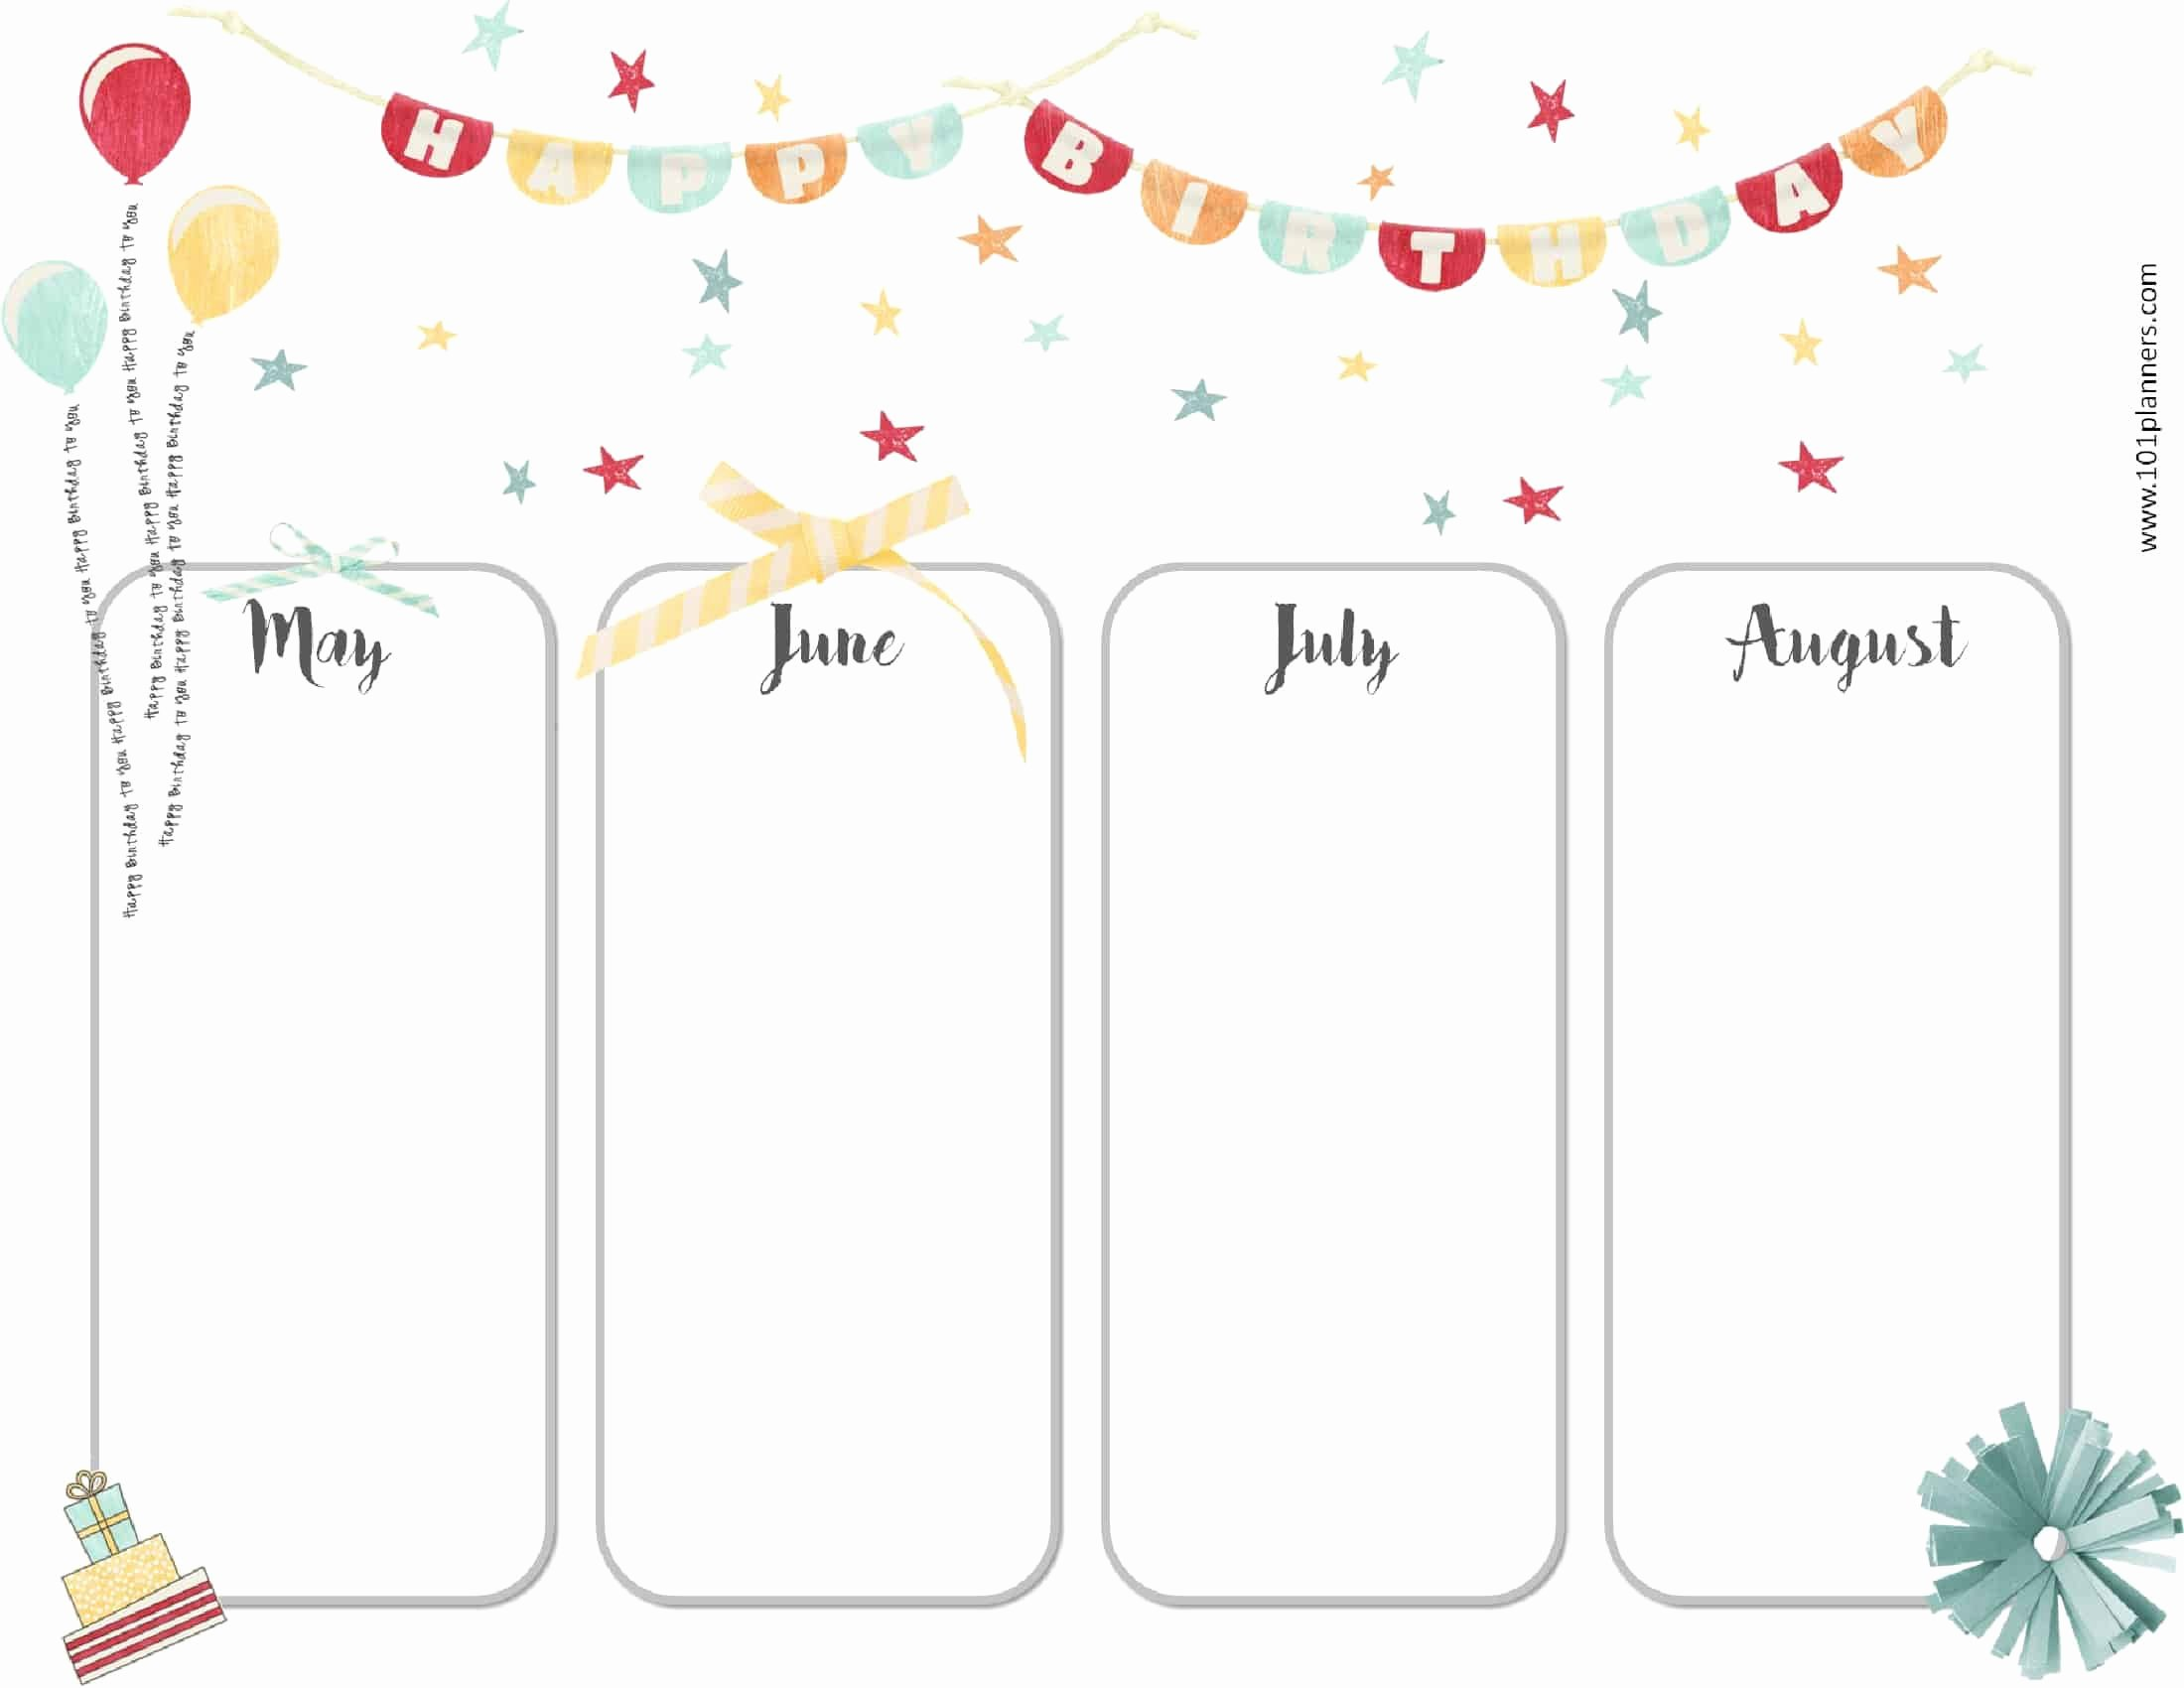 Printable Birthday Calendar Template New Free Birthday Calendar Printable & Customizable